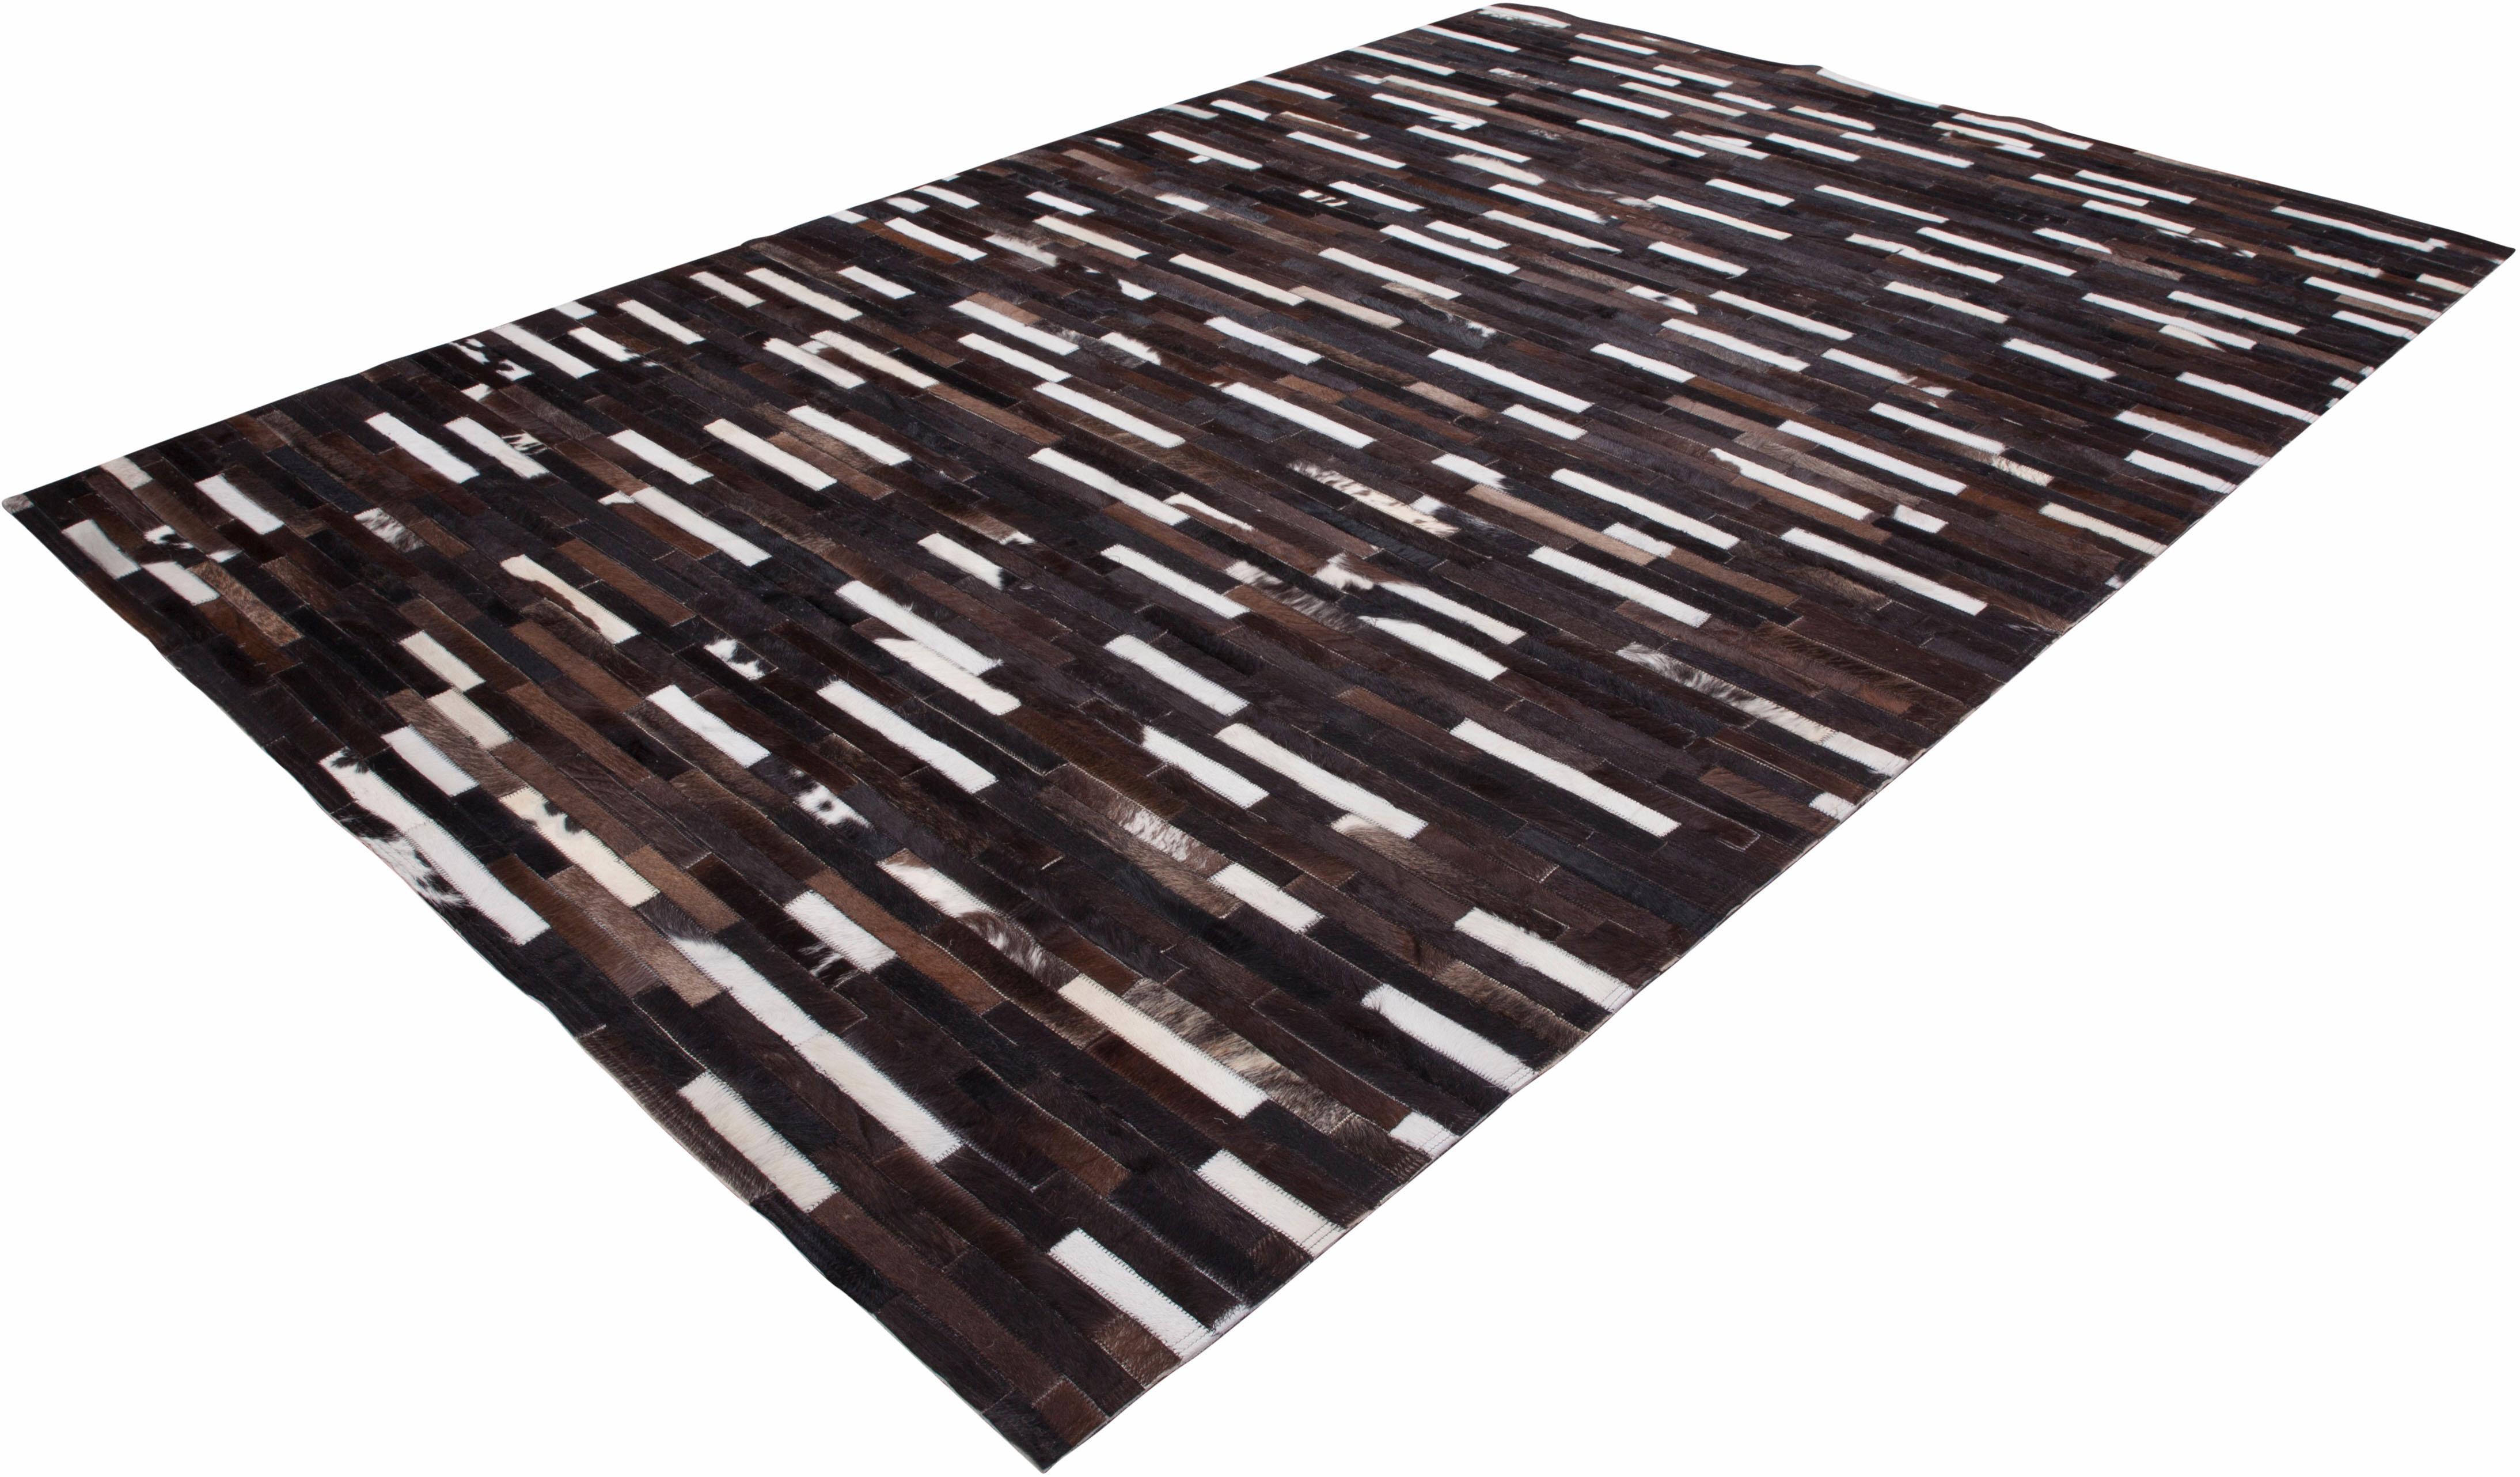 Lederteppich Patchwork 851 LALEE rechteckig Höhe 5 mm